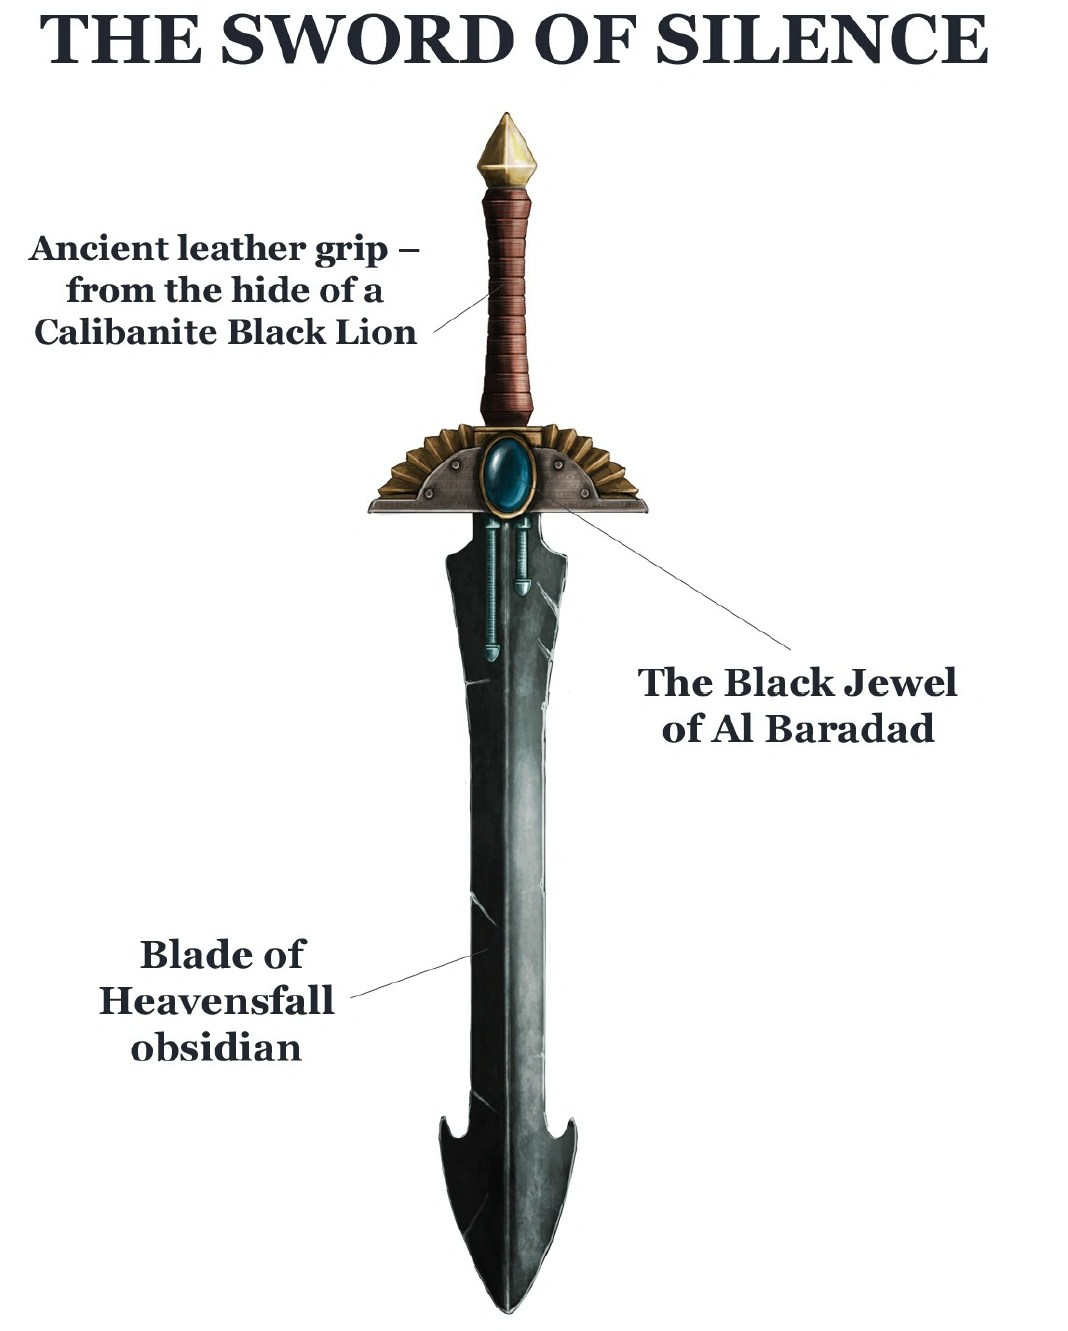 Image Sword Of Silence Belialpng Warhammer 40k